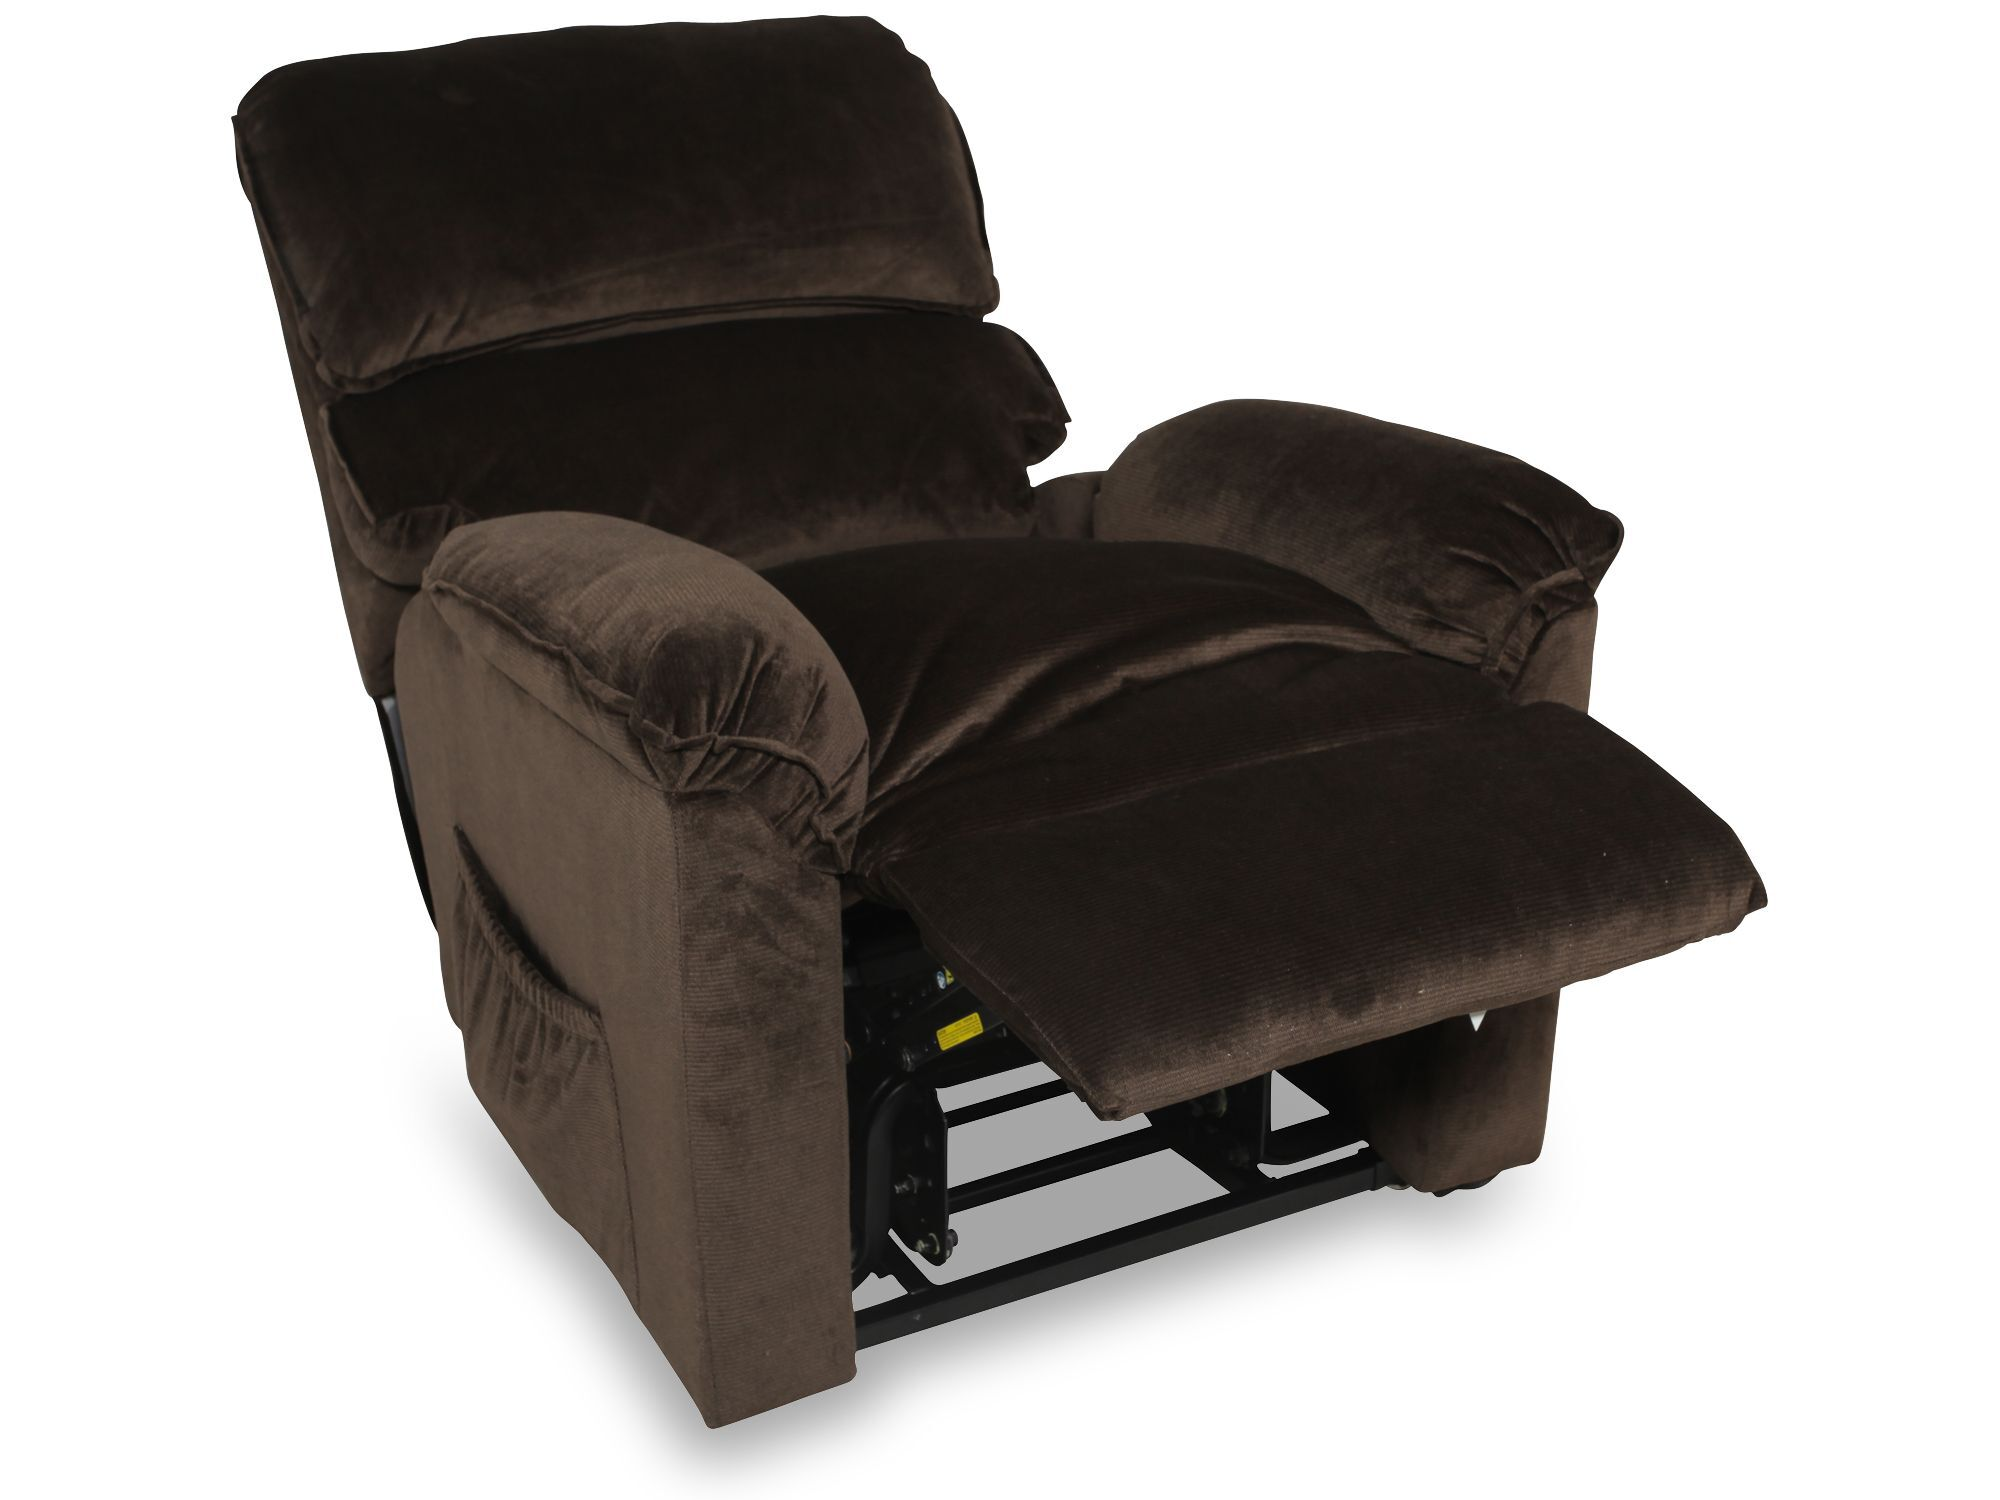 Lane Harold Lift Chair Recliner  sc 1 st  Mathis Brothers & Lane Harold Lift Chair Recliner | Mathis Brothers Furniture islam-shia.org